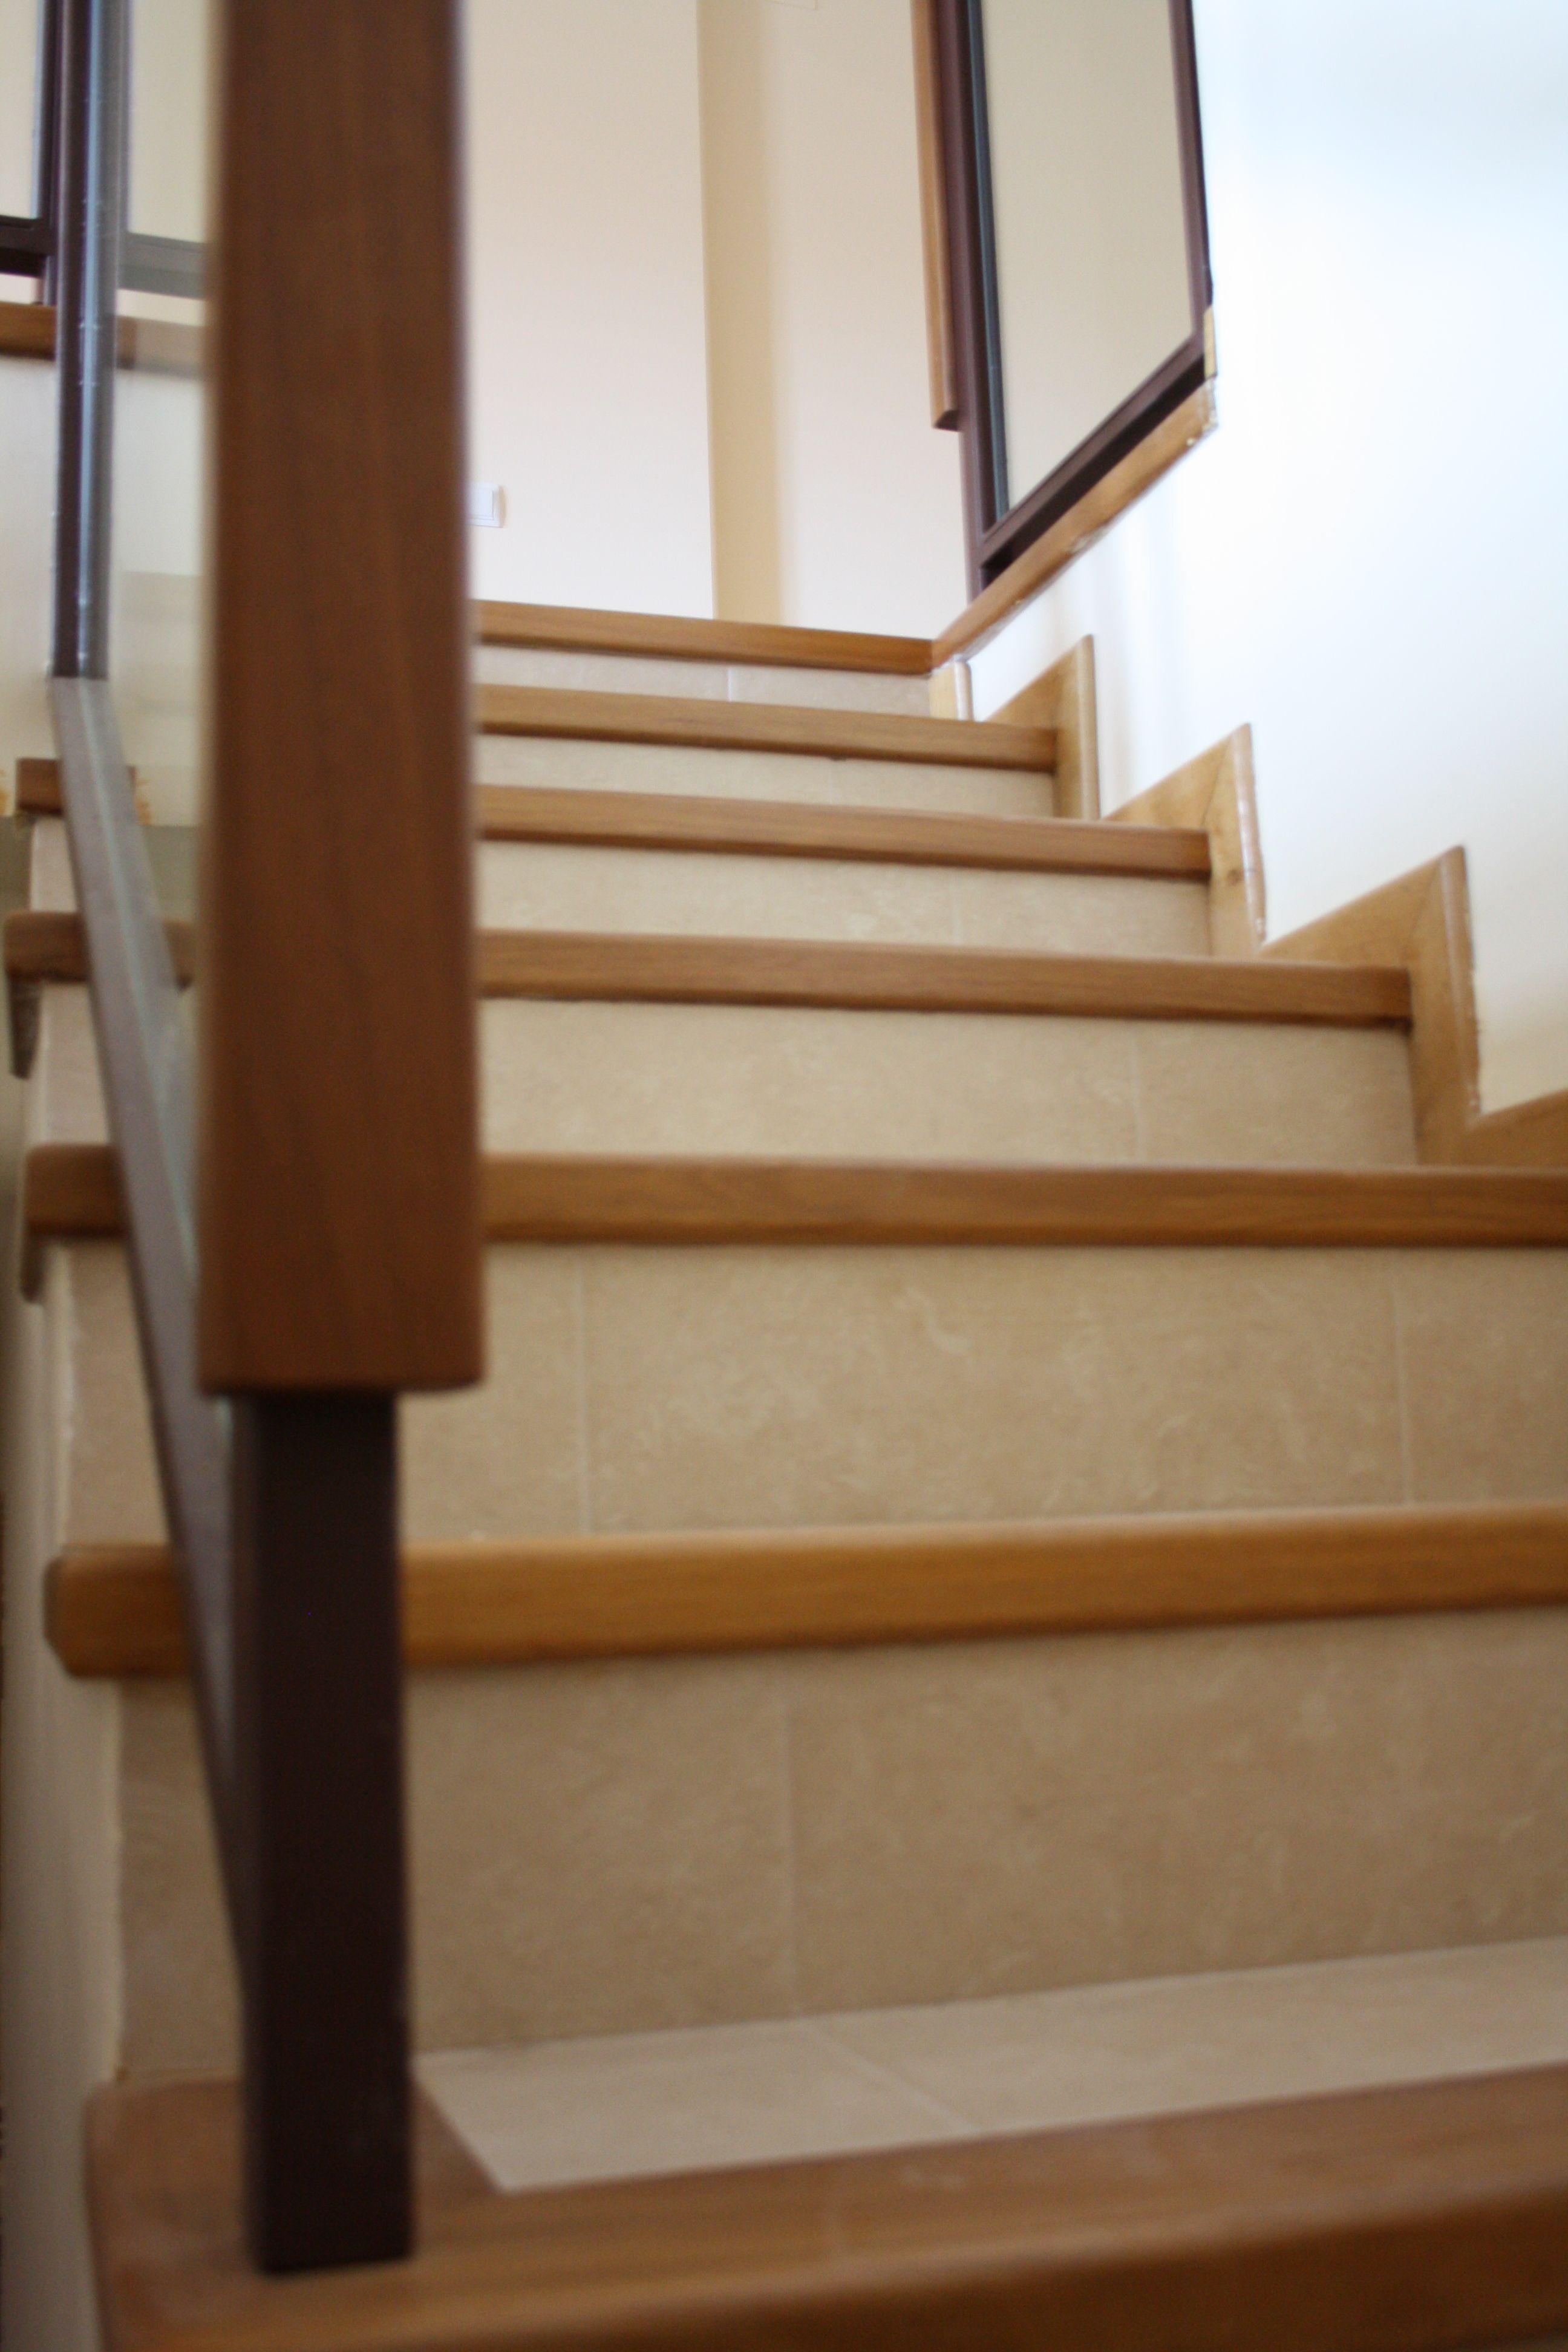 Mamperlanes de escalera madera maciza de iroko escaleras for Escalera madera decoracion